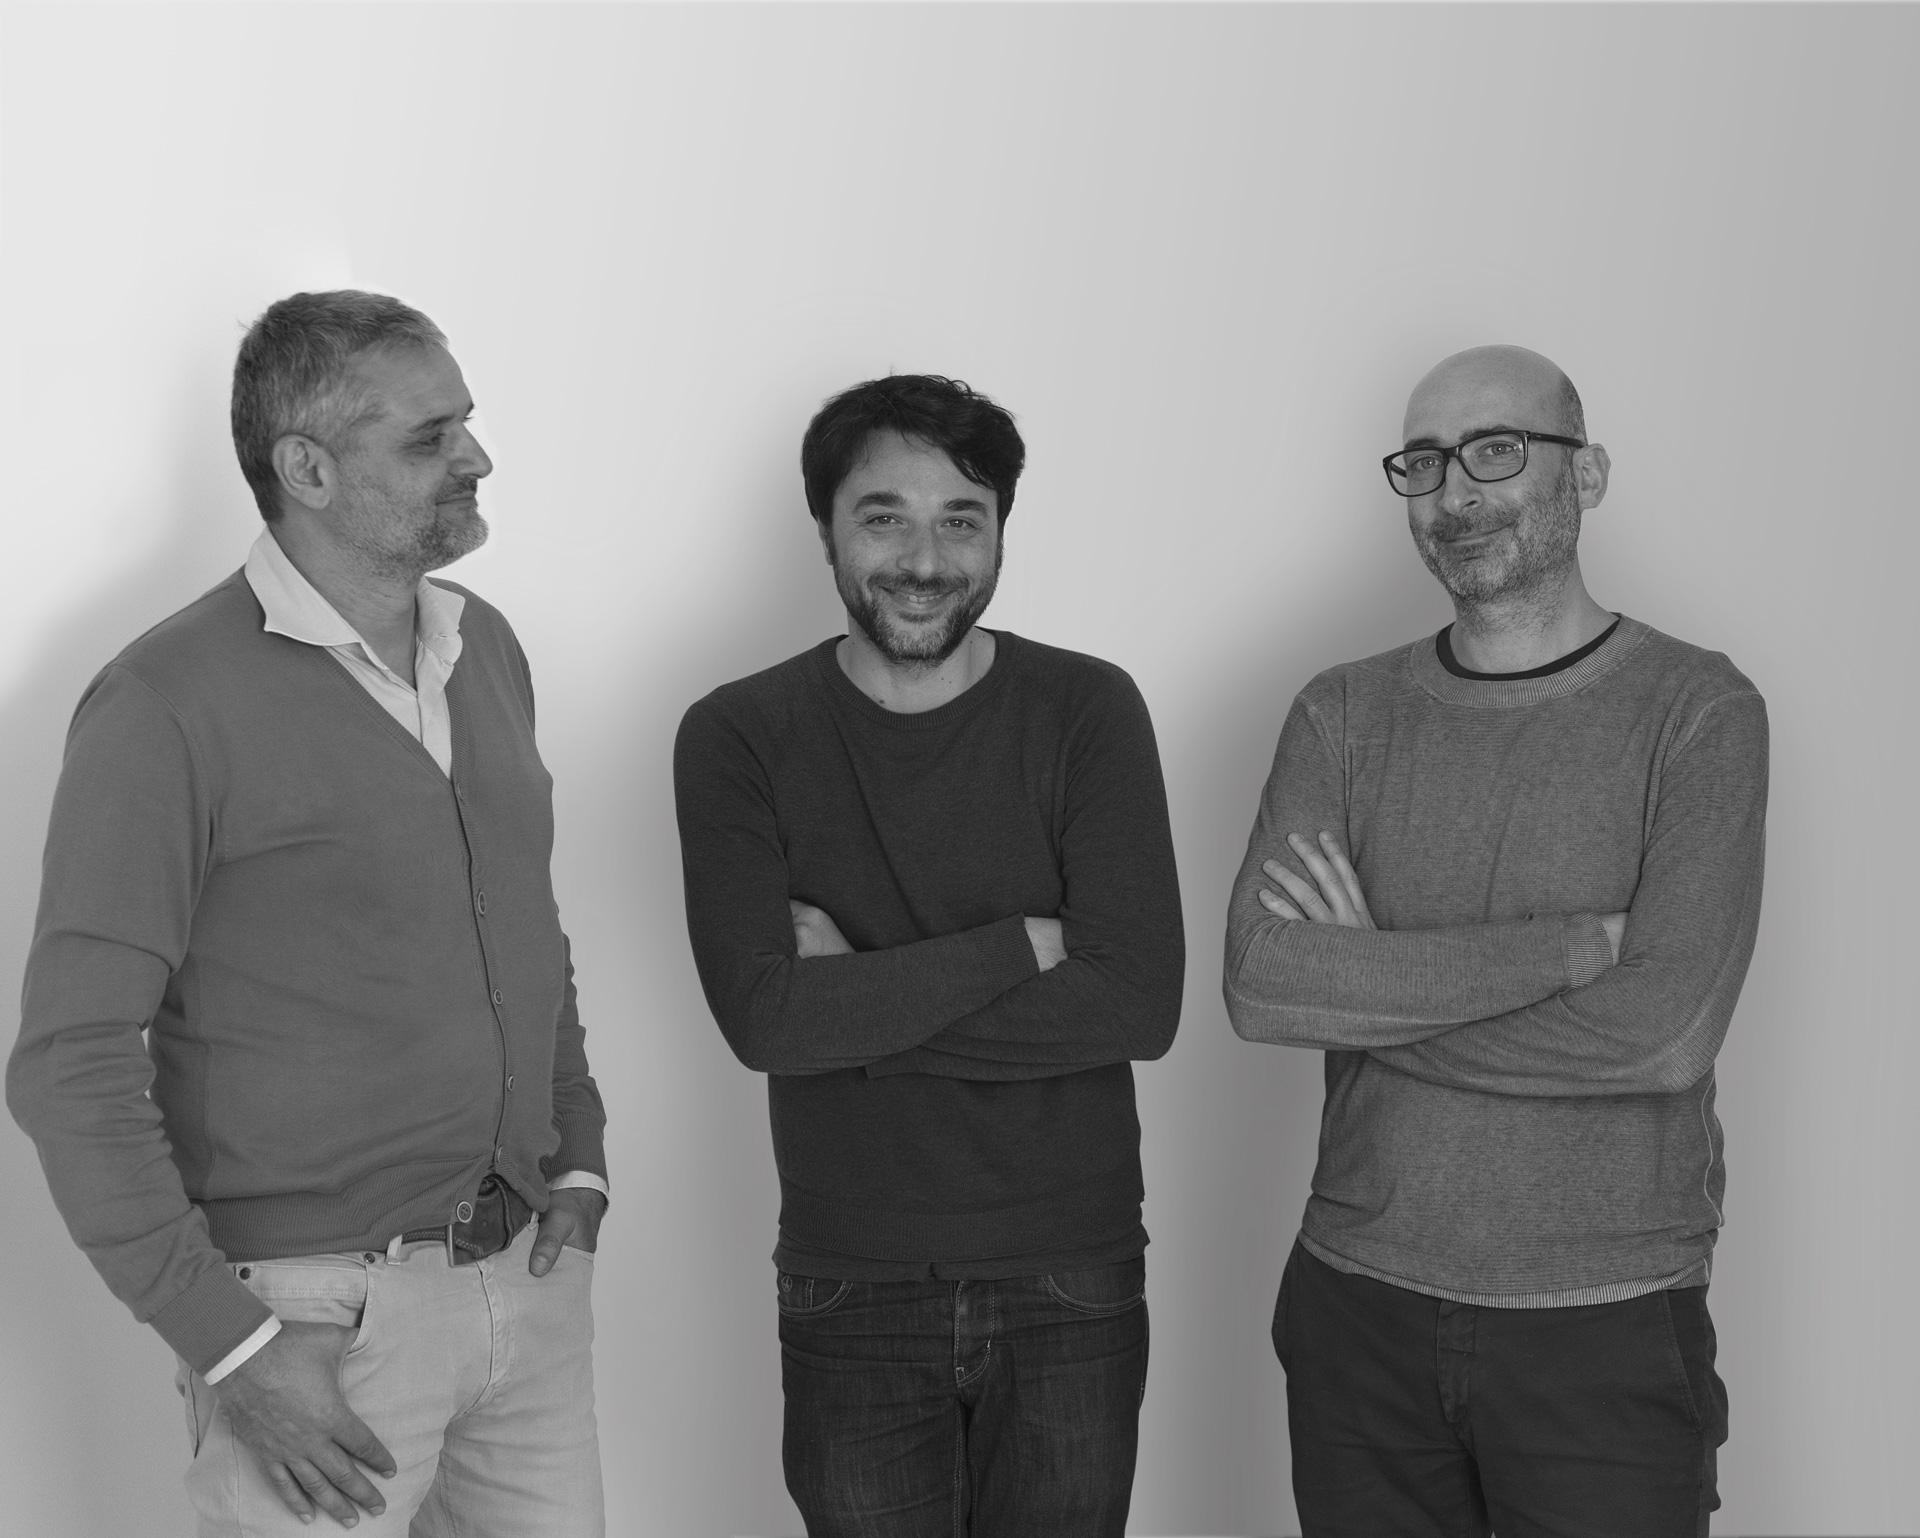 Atelier790 / (da sx) Antonio Giancontieri, Leonardo Vaccaro, Nino Lombino